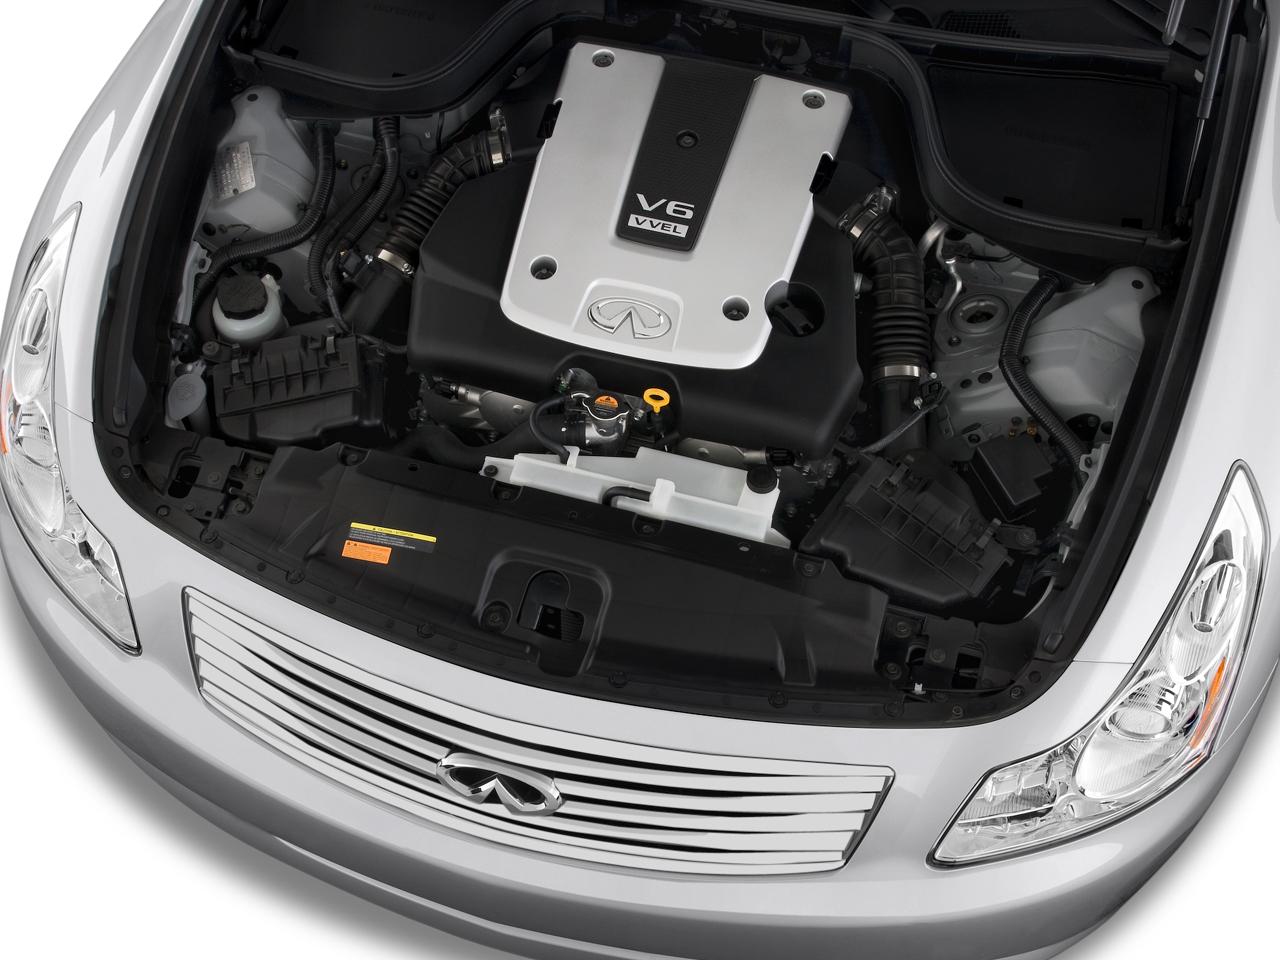 2009 infiniti g37 coupe sedan pricing announced 6125 vanachro Gallery